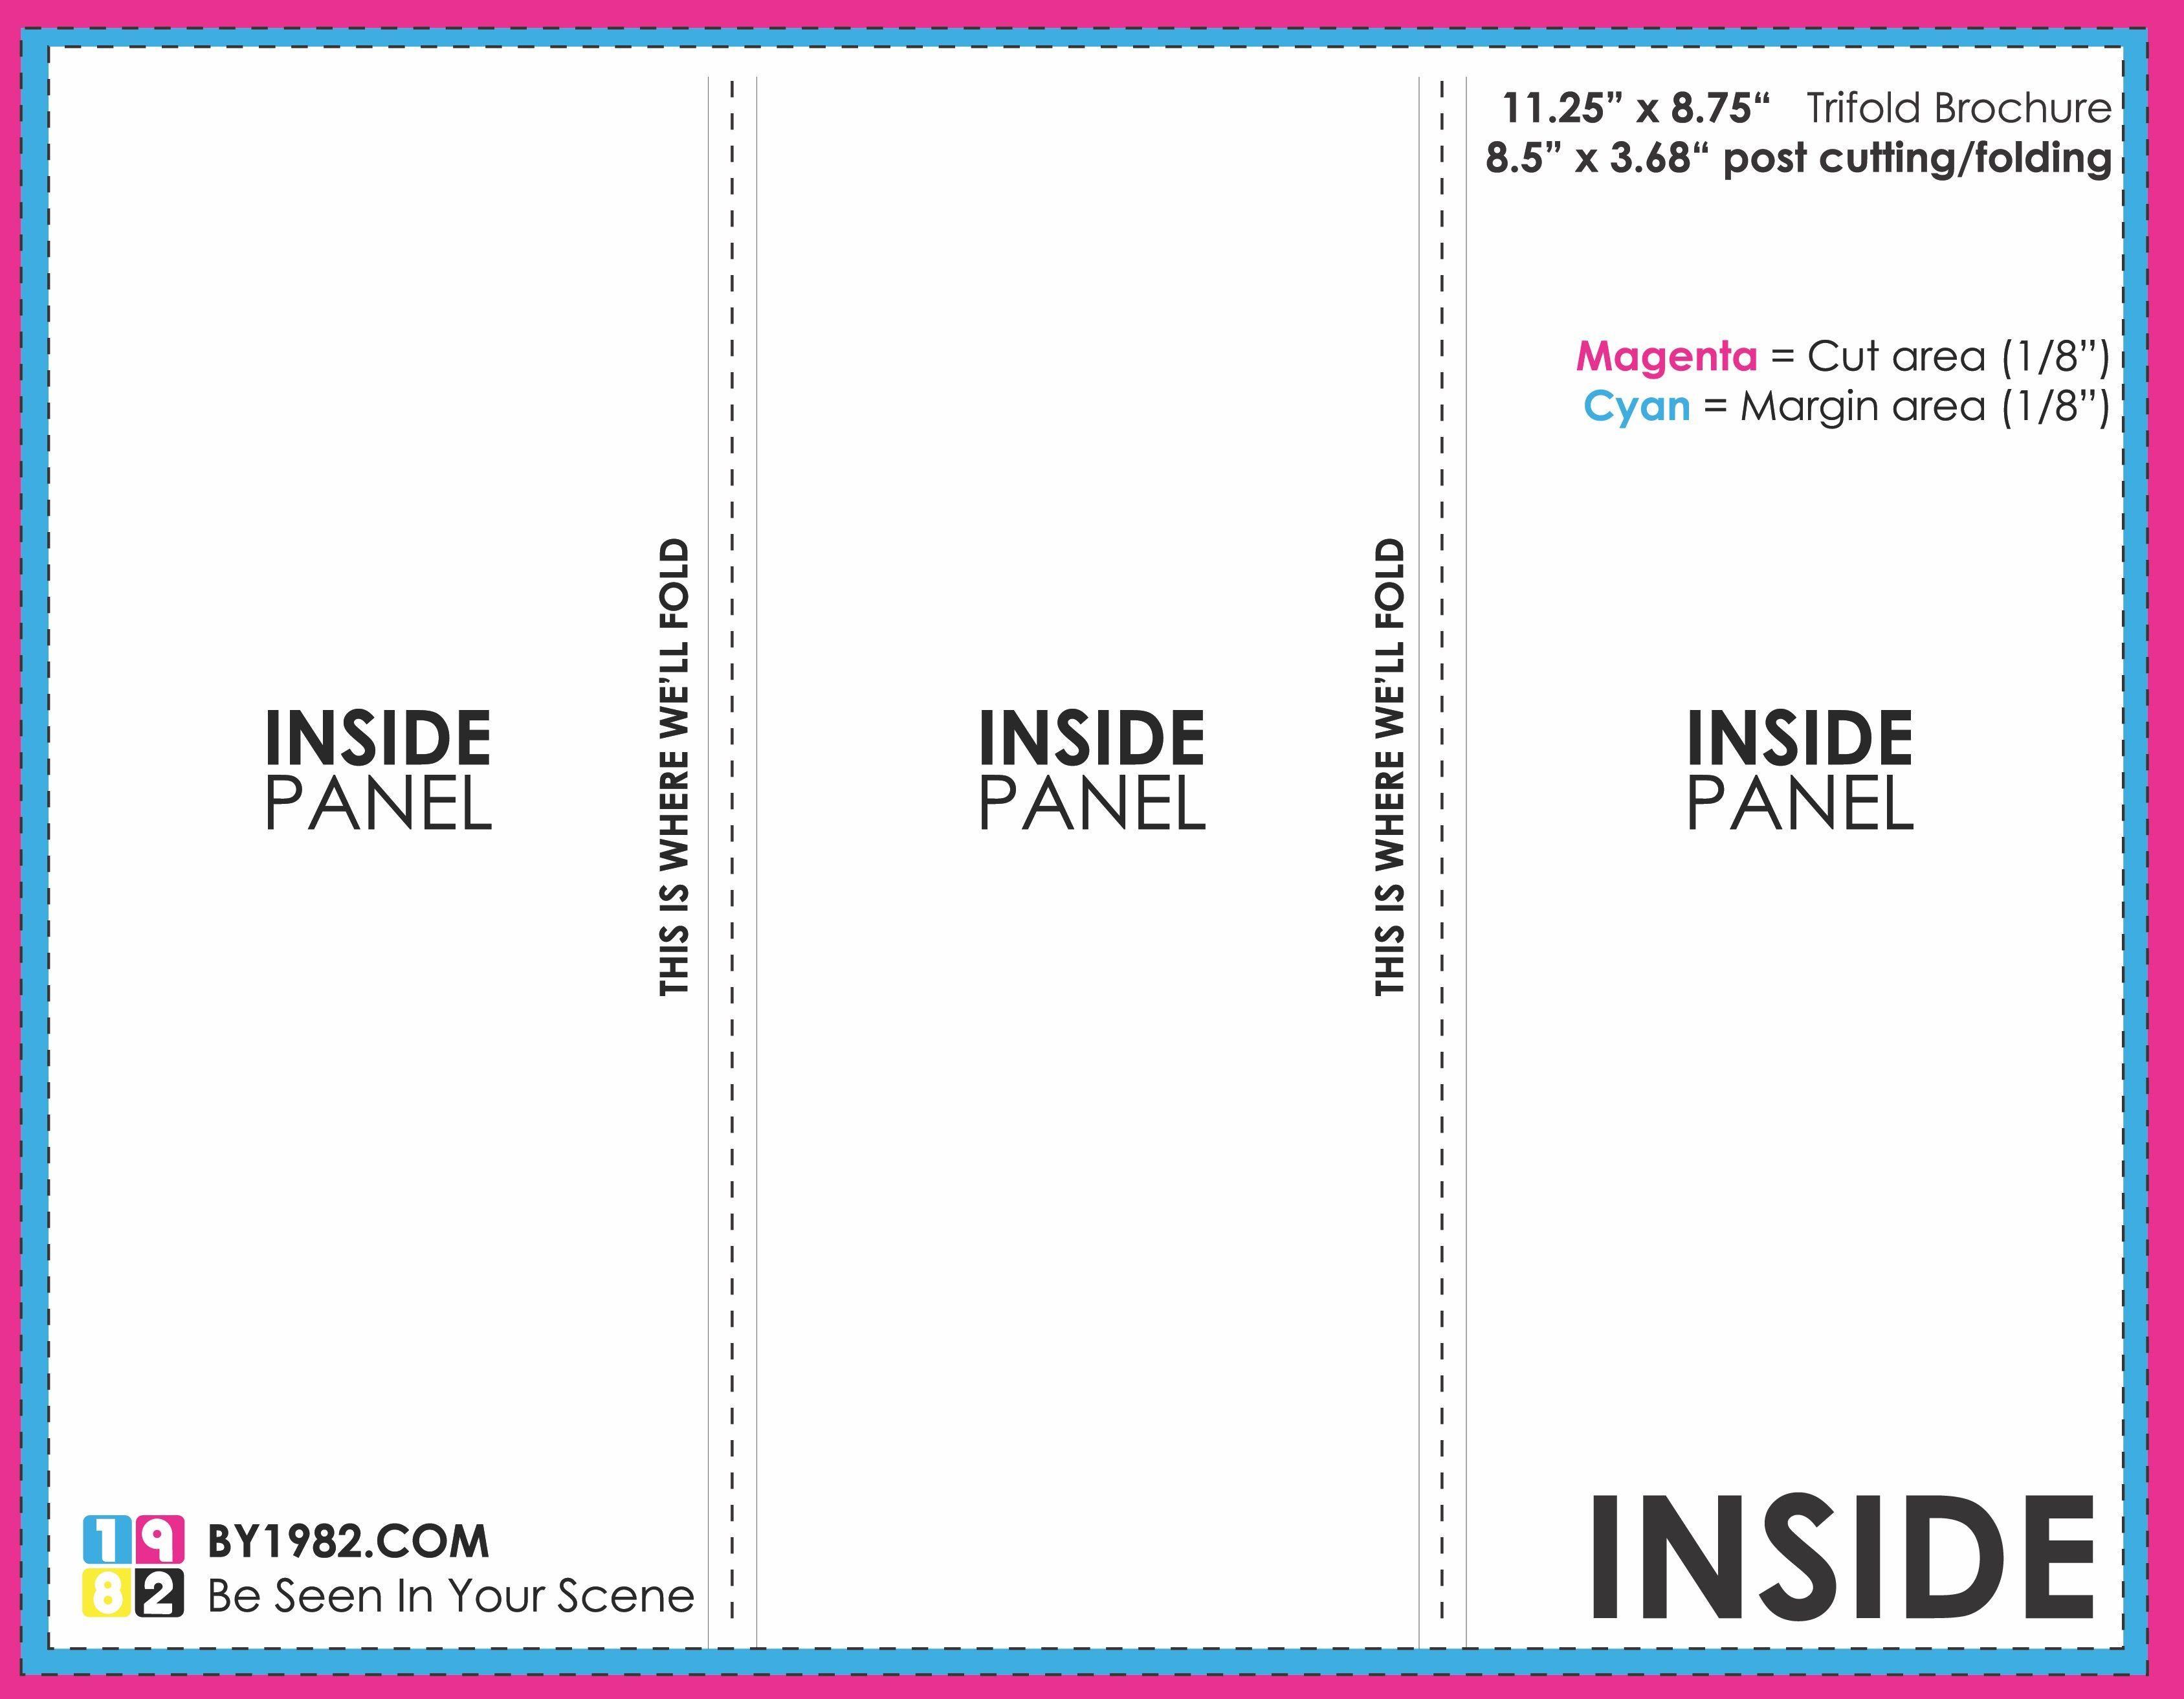 000 Unique Tri Fold Template Google Doc Image  Docs Brochure Free Pamphlet Blank SlideFull